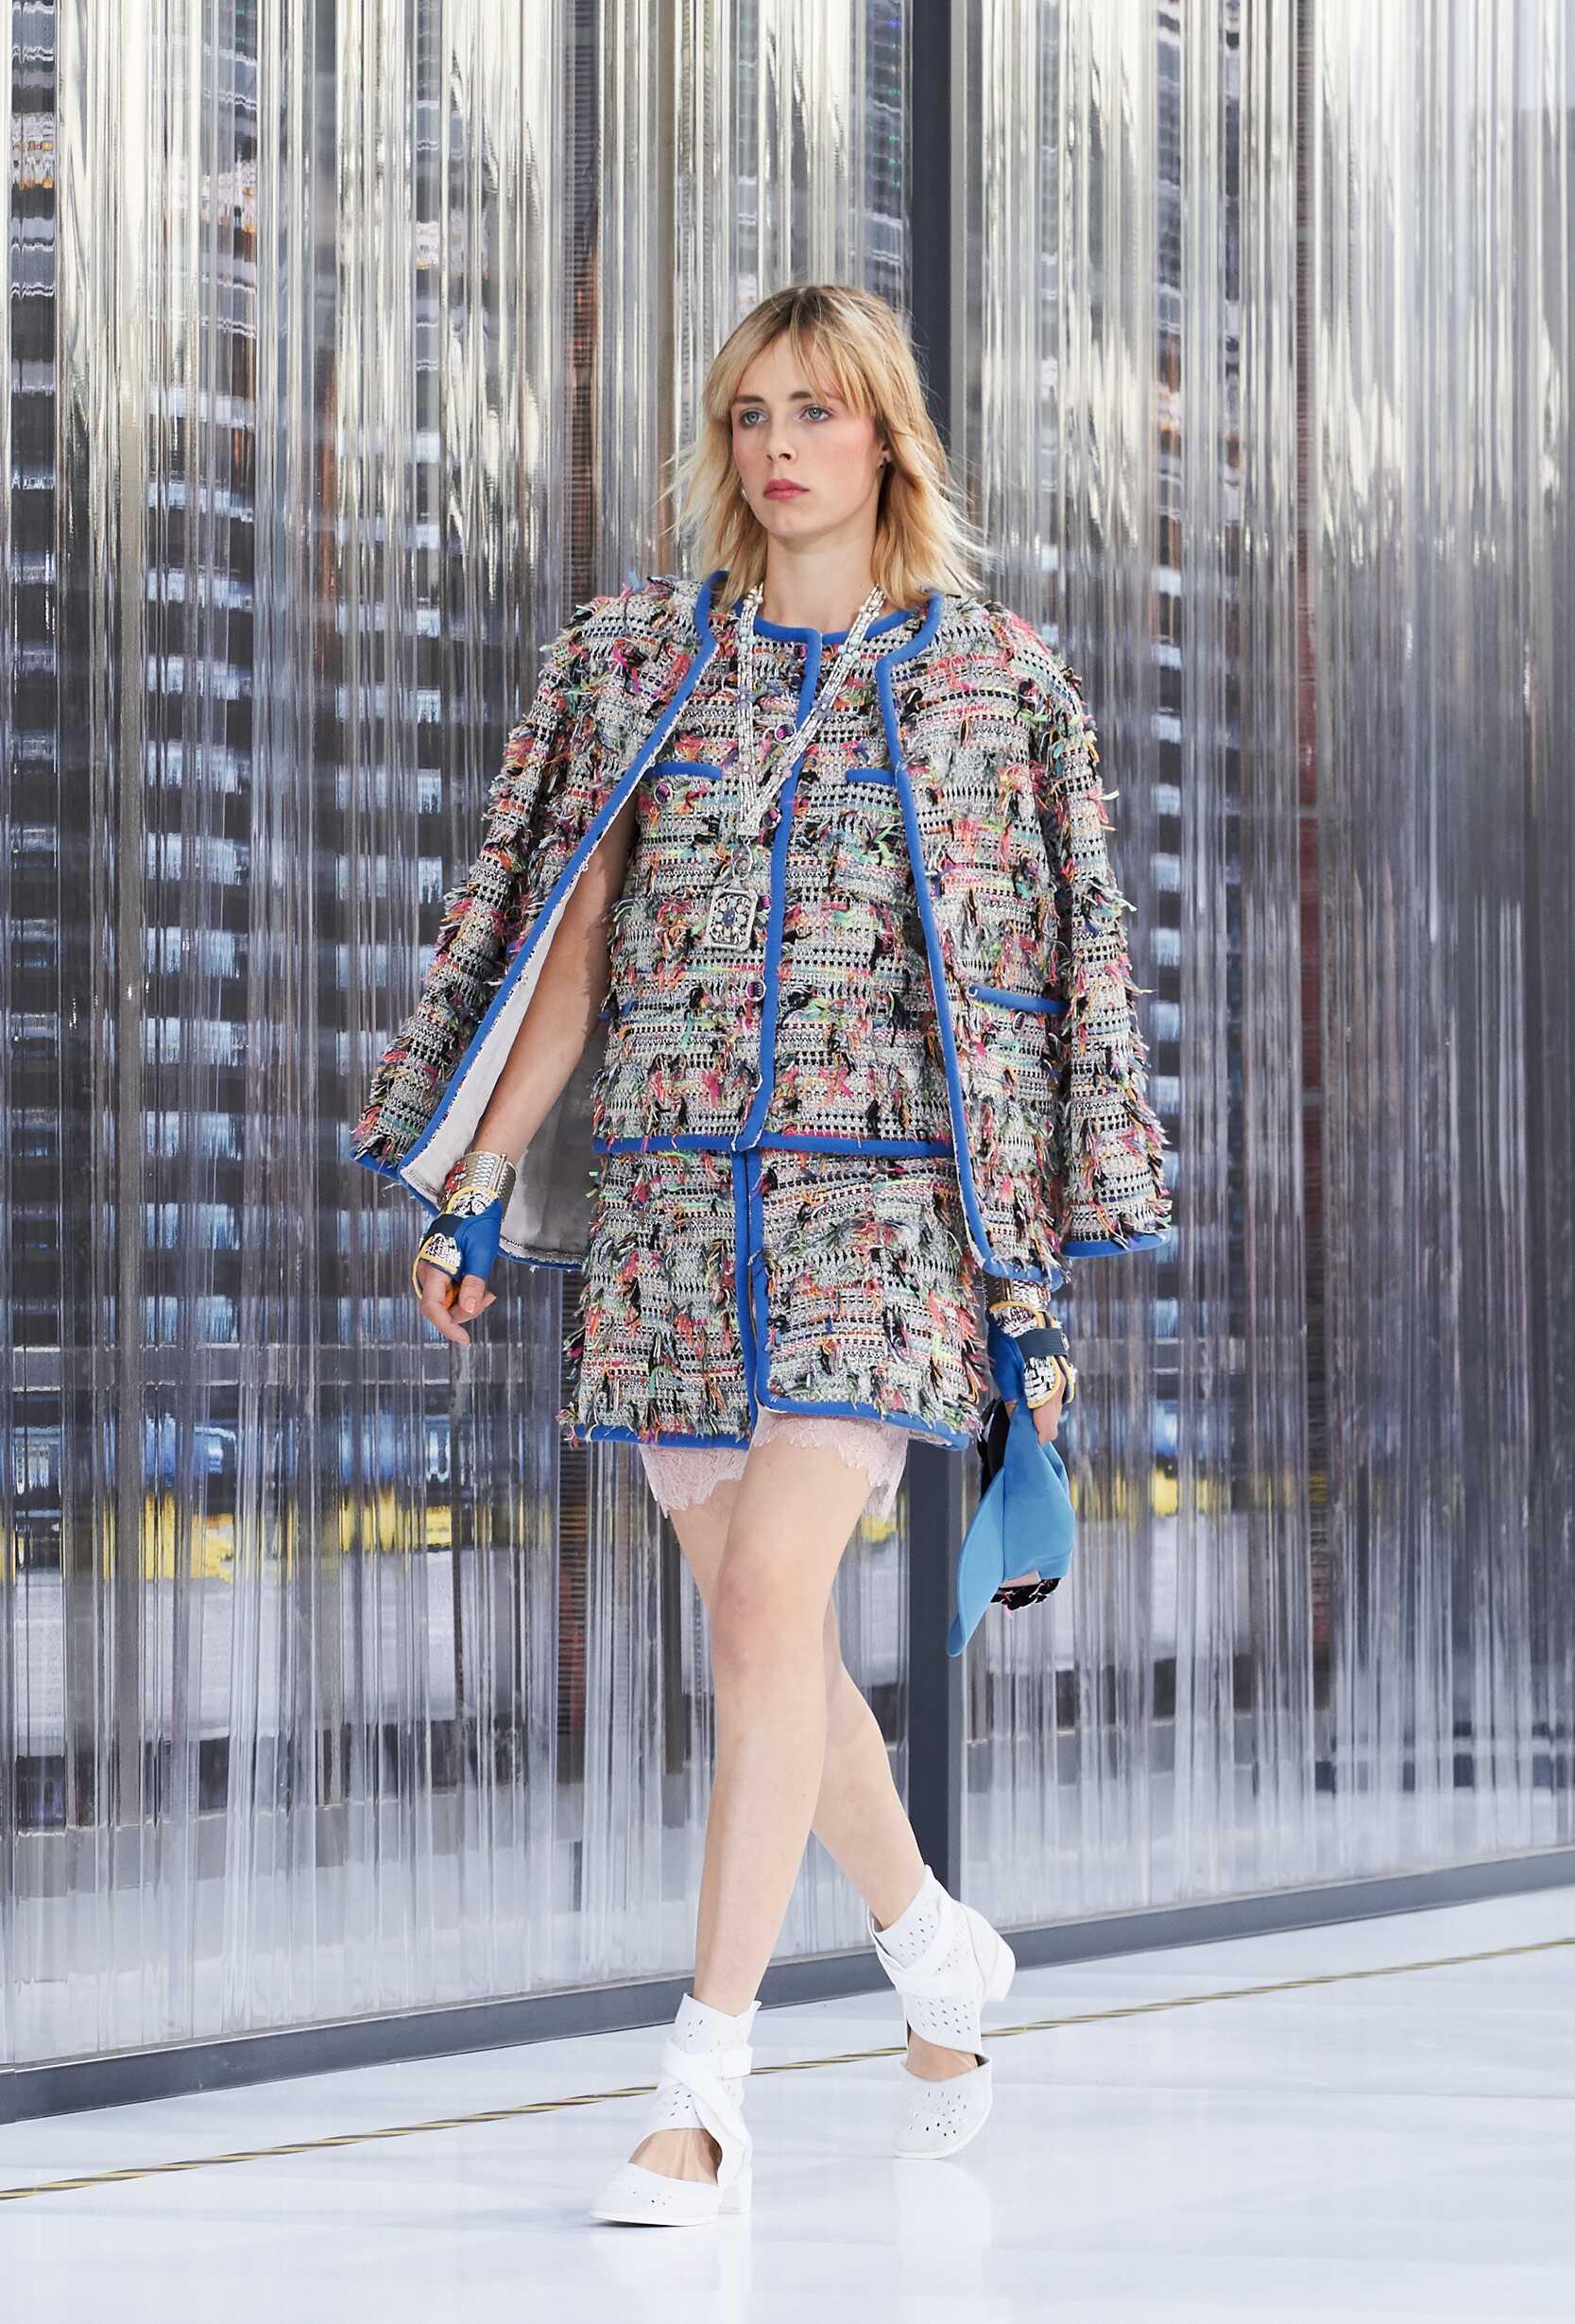 Chanel Woman 2017